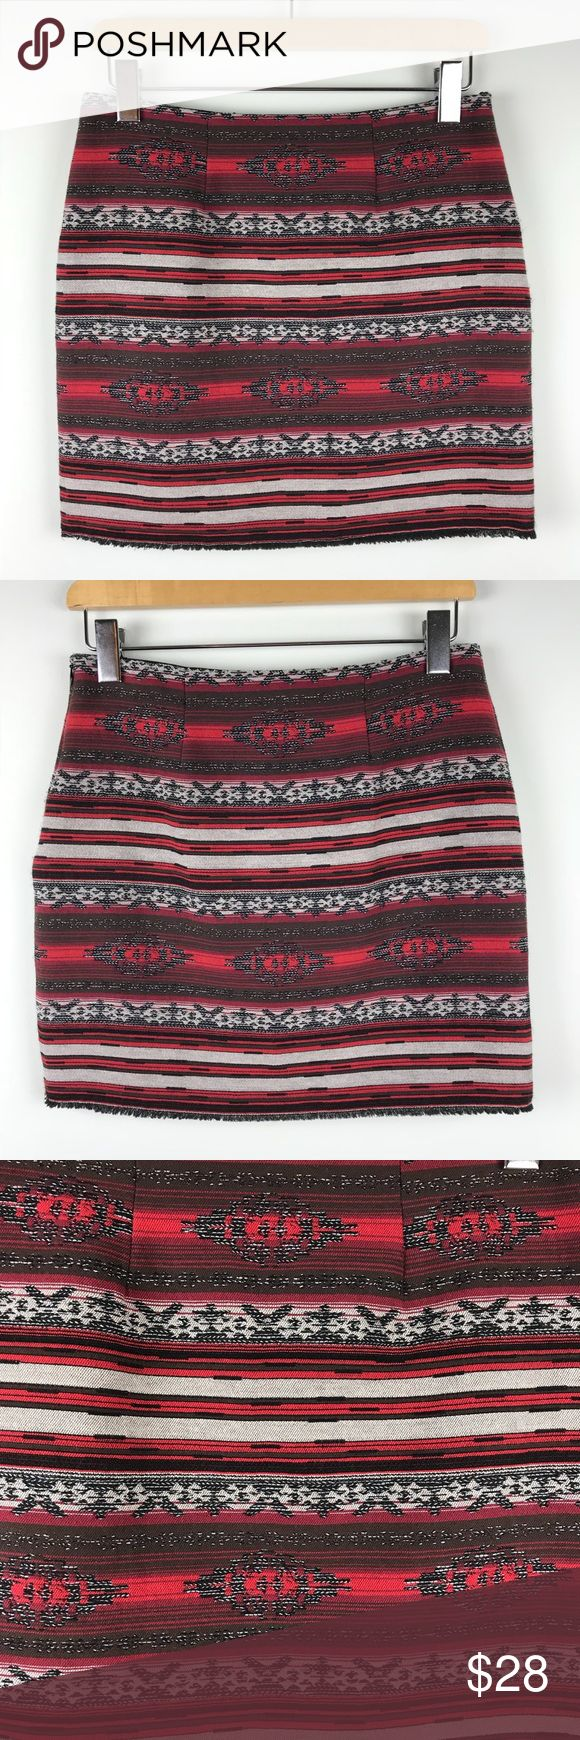 "Fifteen Twenty Aztec Mini Skirt Size 2 This Fifteen Twenty Aztec skirt size 2 is in excellent pre-owned condition. No stains, rips or odors.  ▪️waist laying flat across 14"" ▪️length 15"" Fifteen Twenty Skirts Mini"